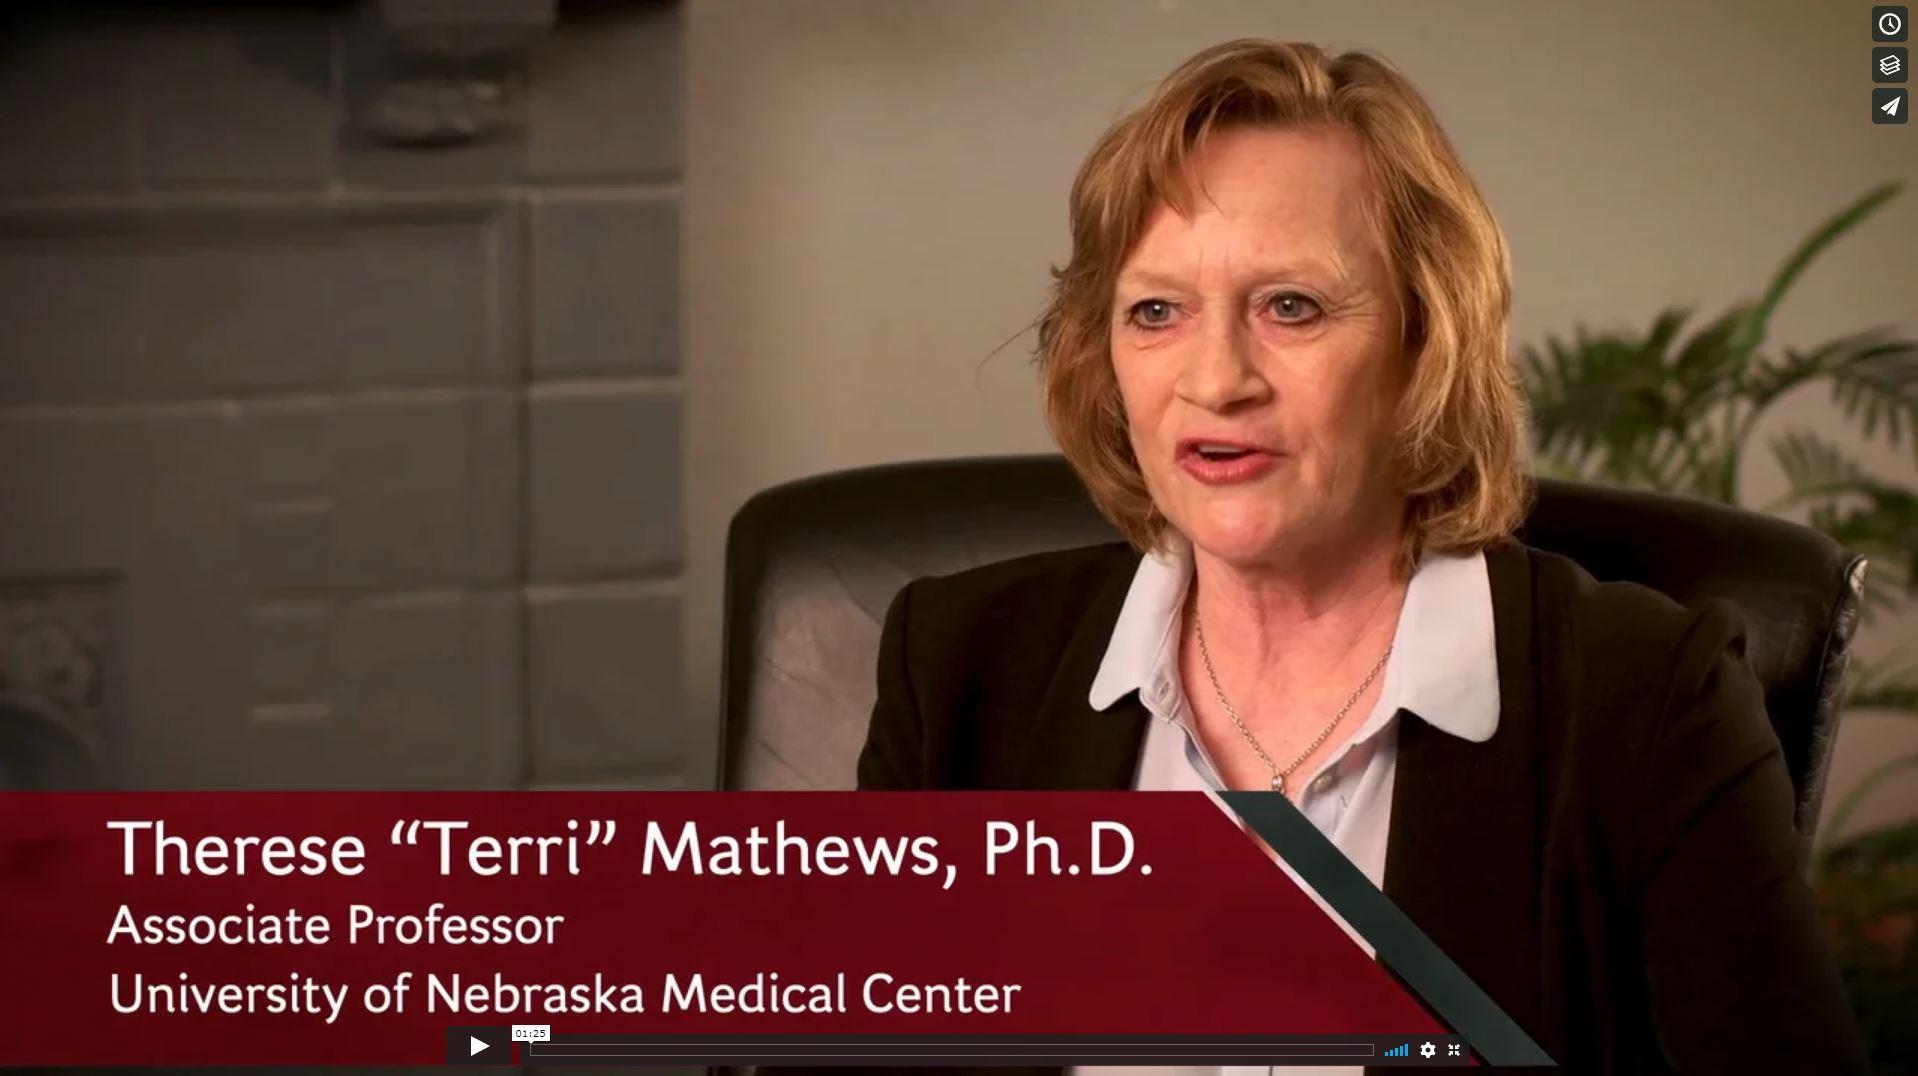 dr-terri-mathews-screen-shot.JPG